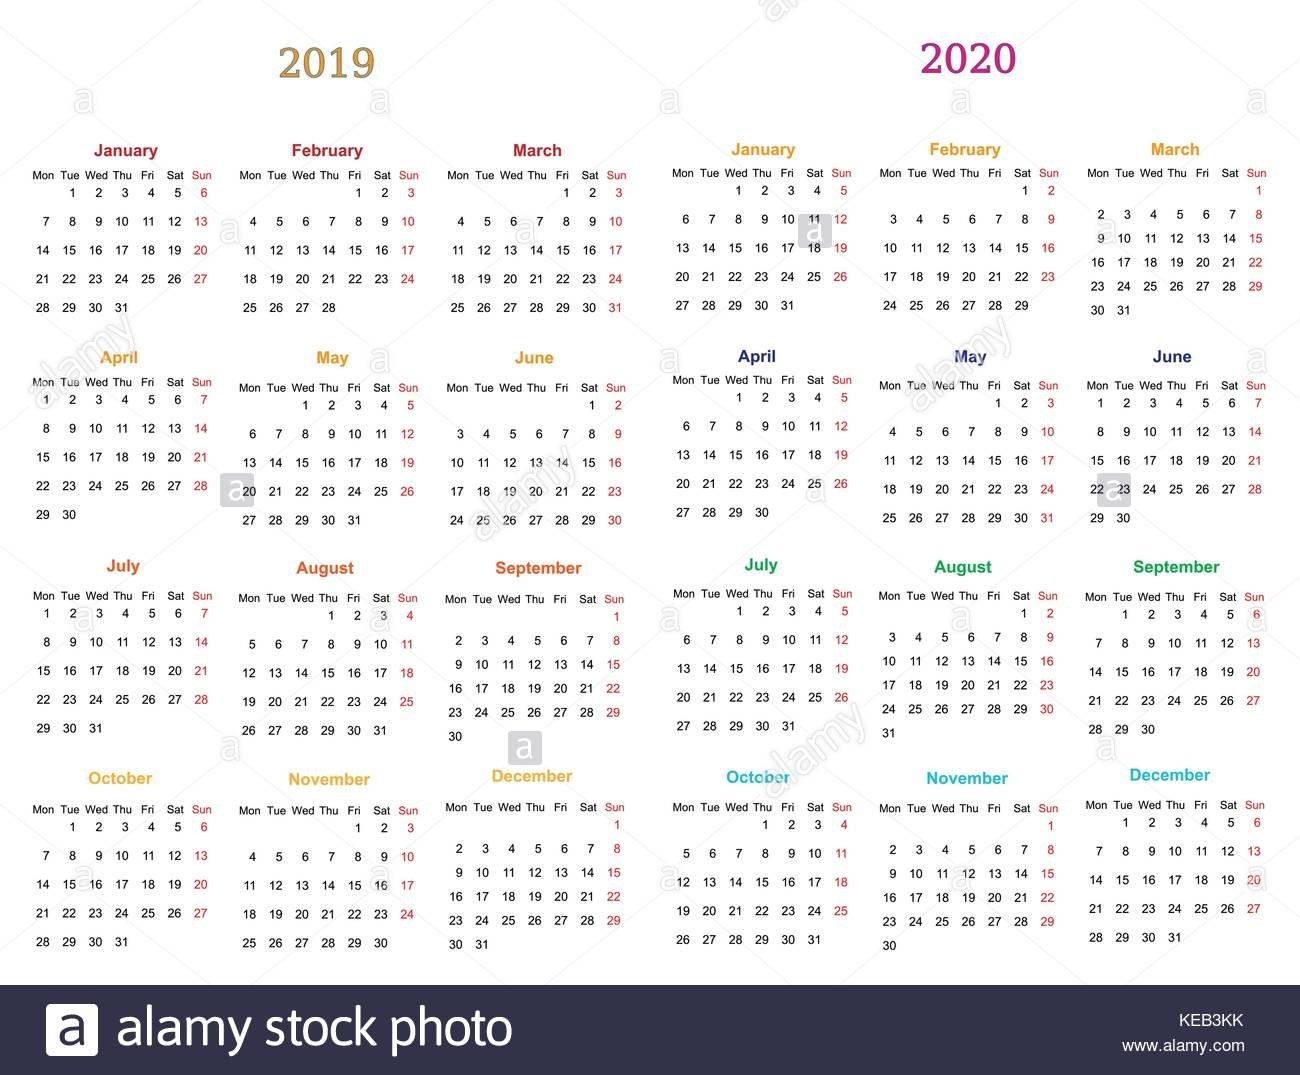 12 Months Calendar Design 2019-2020 Printable And Editable 12 Months Calendar Editable